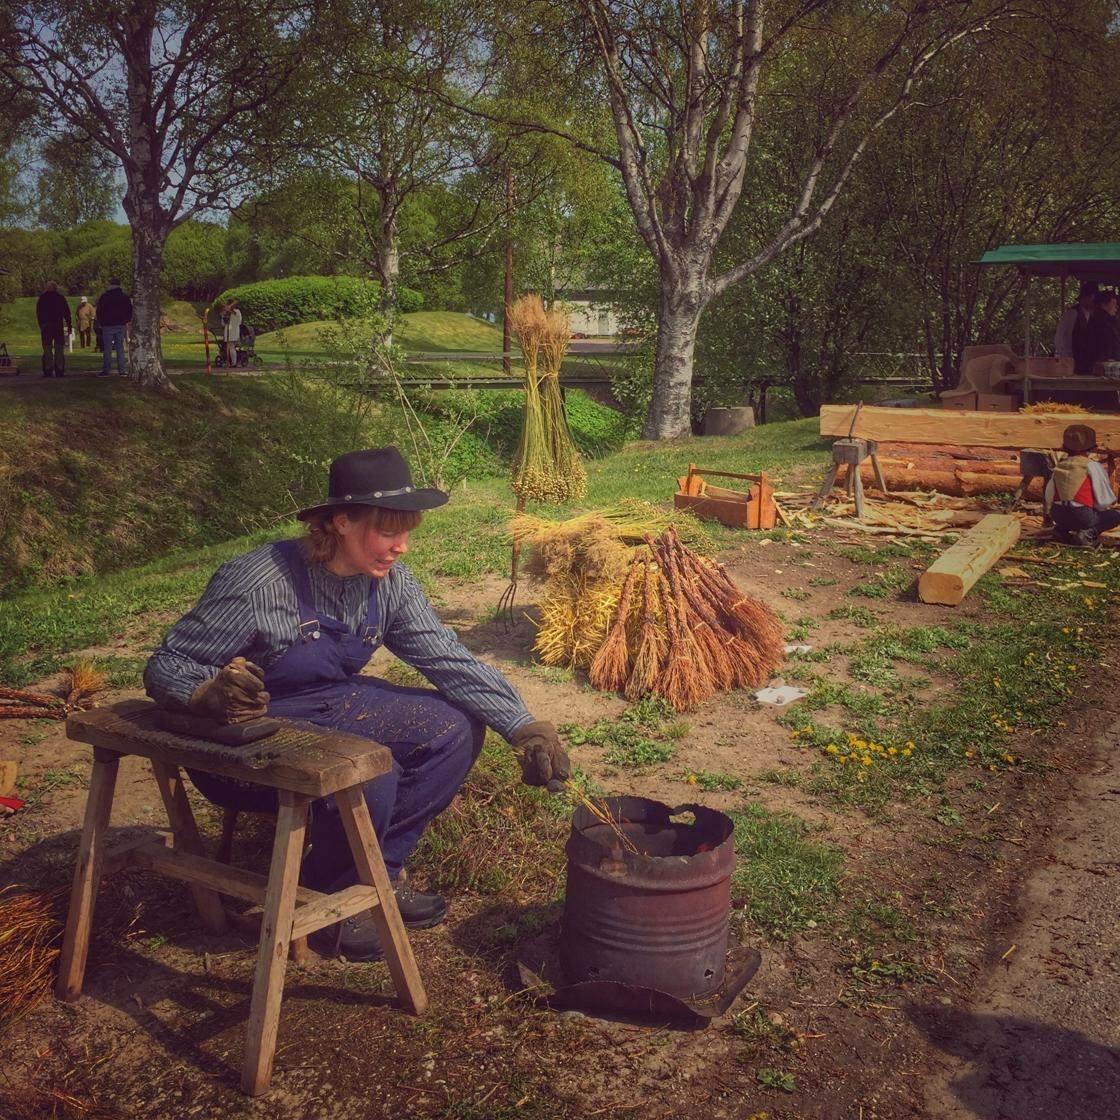 Rural Scenes-00 no script